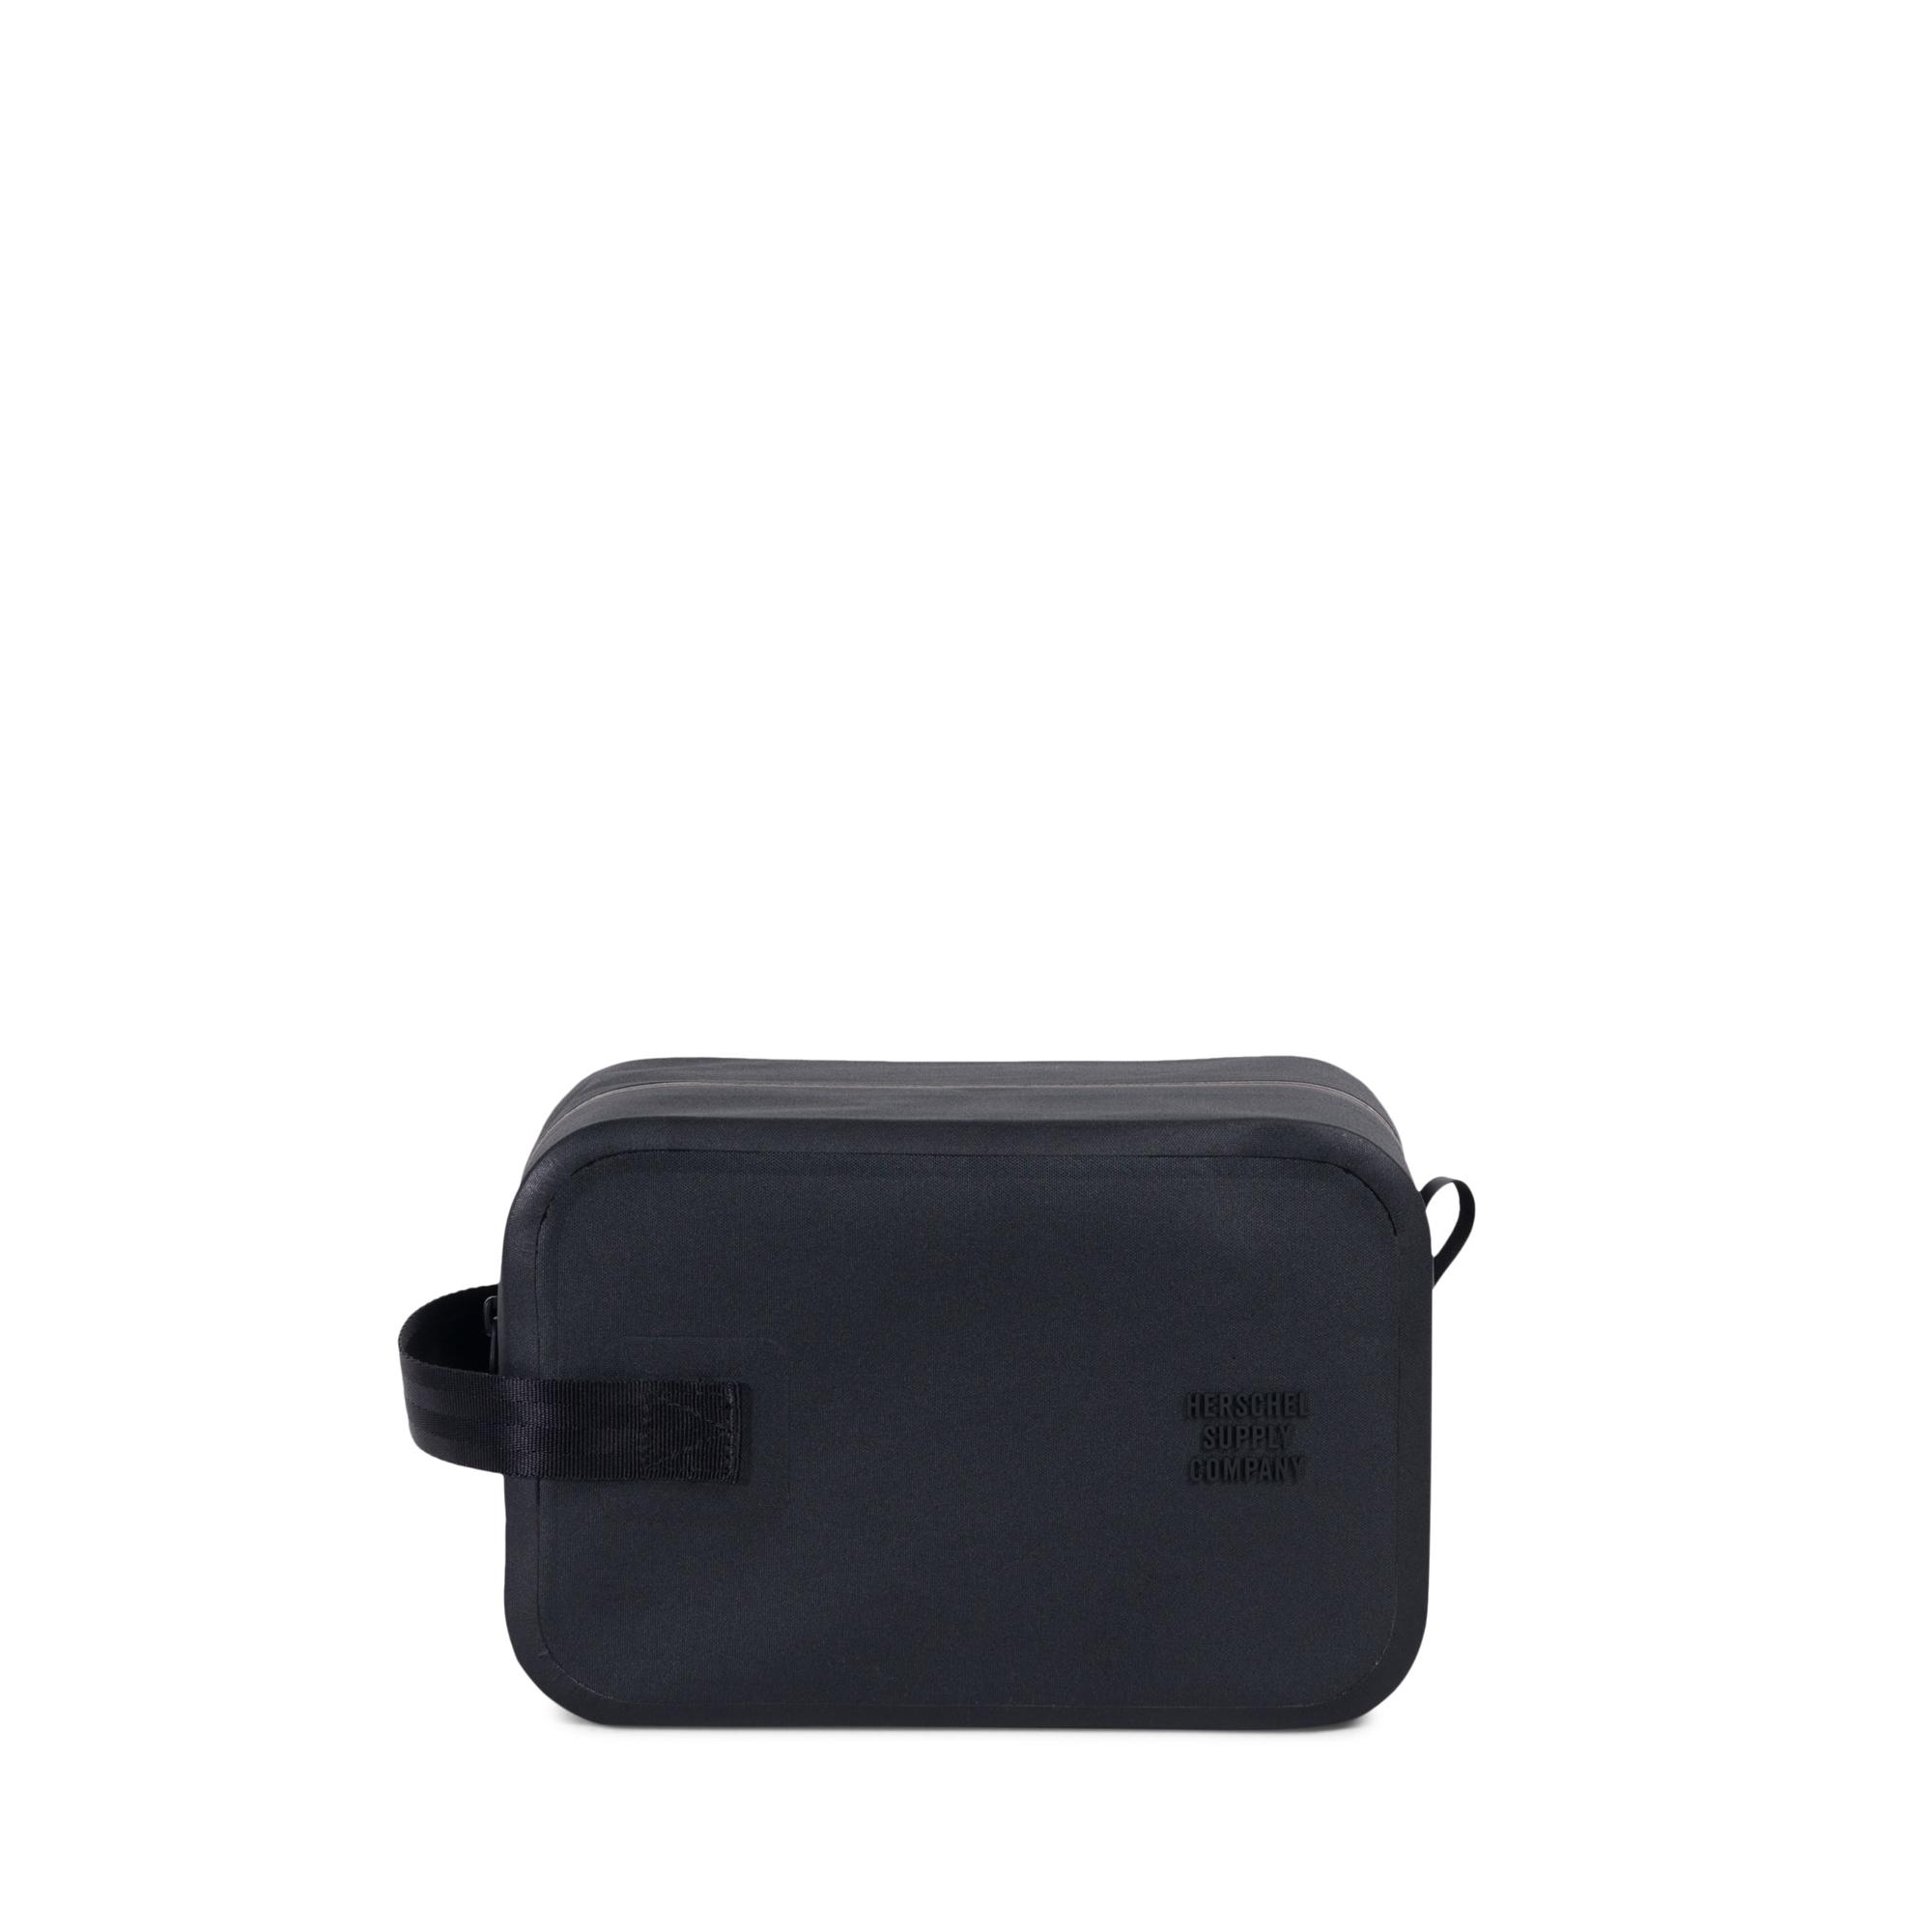 49dd2be82c Chapter Travel Kit Studio | Herschel Supply Company